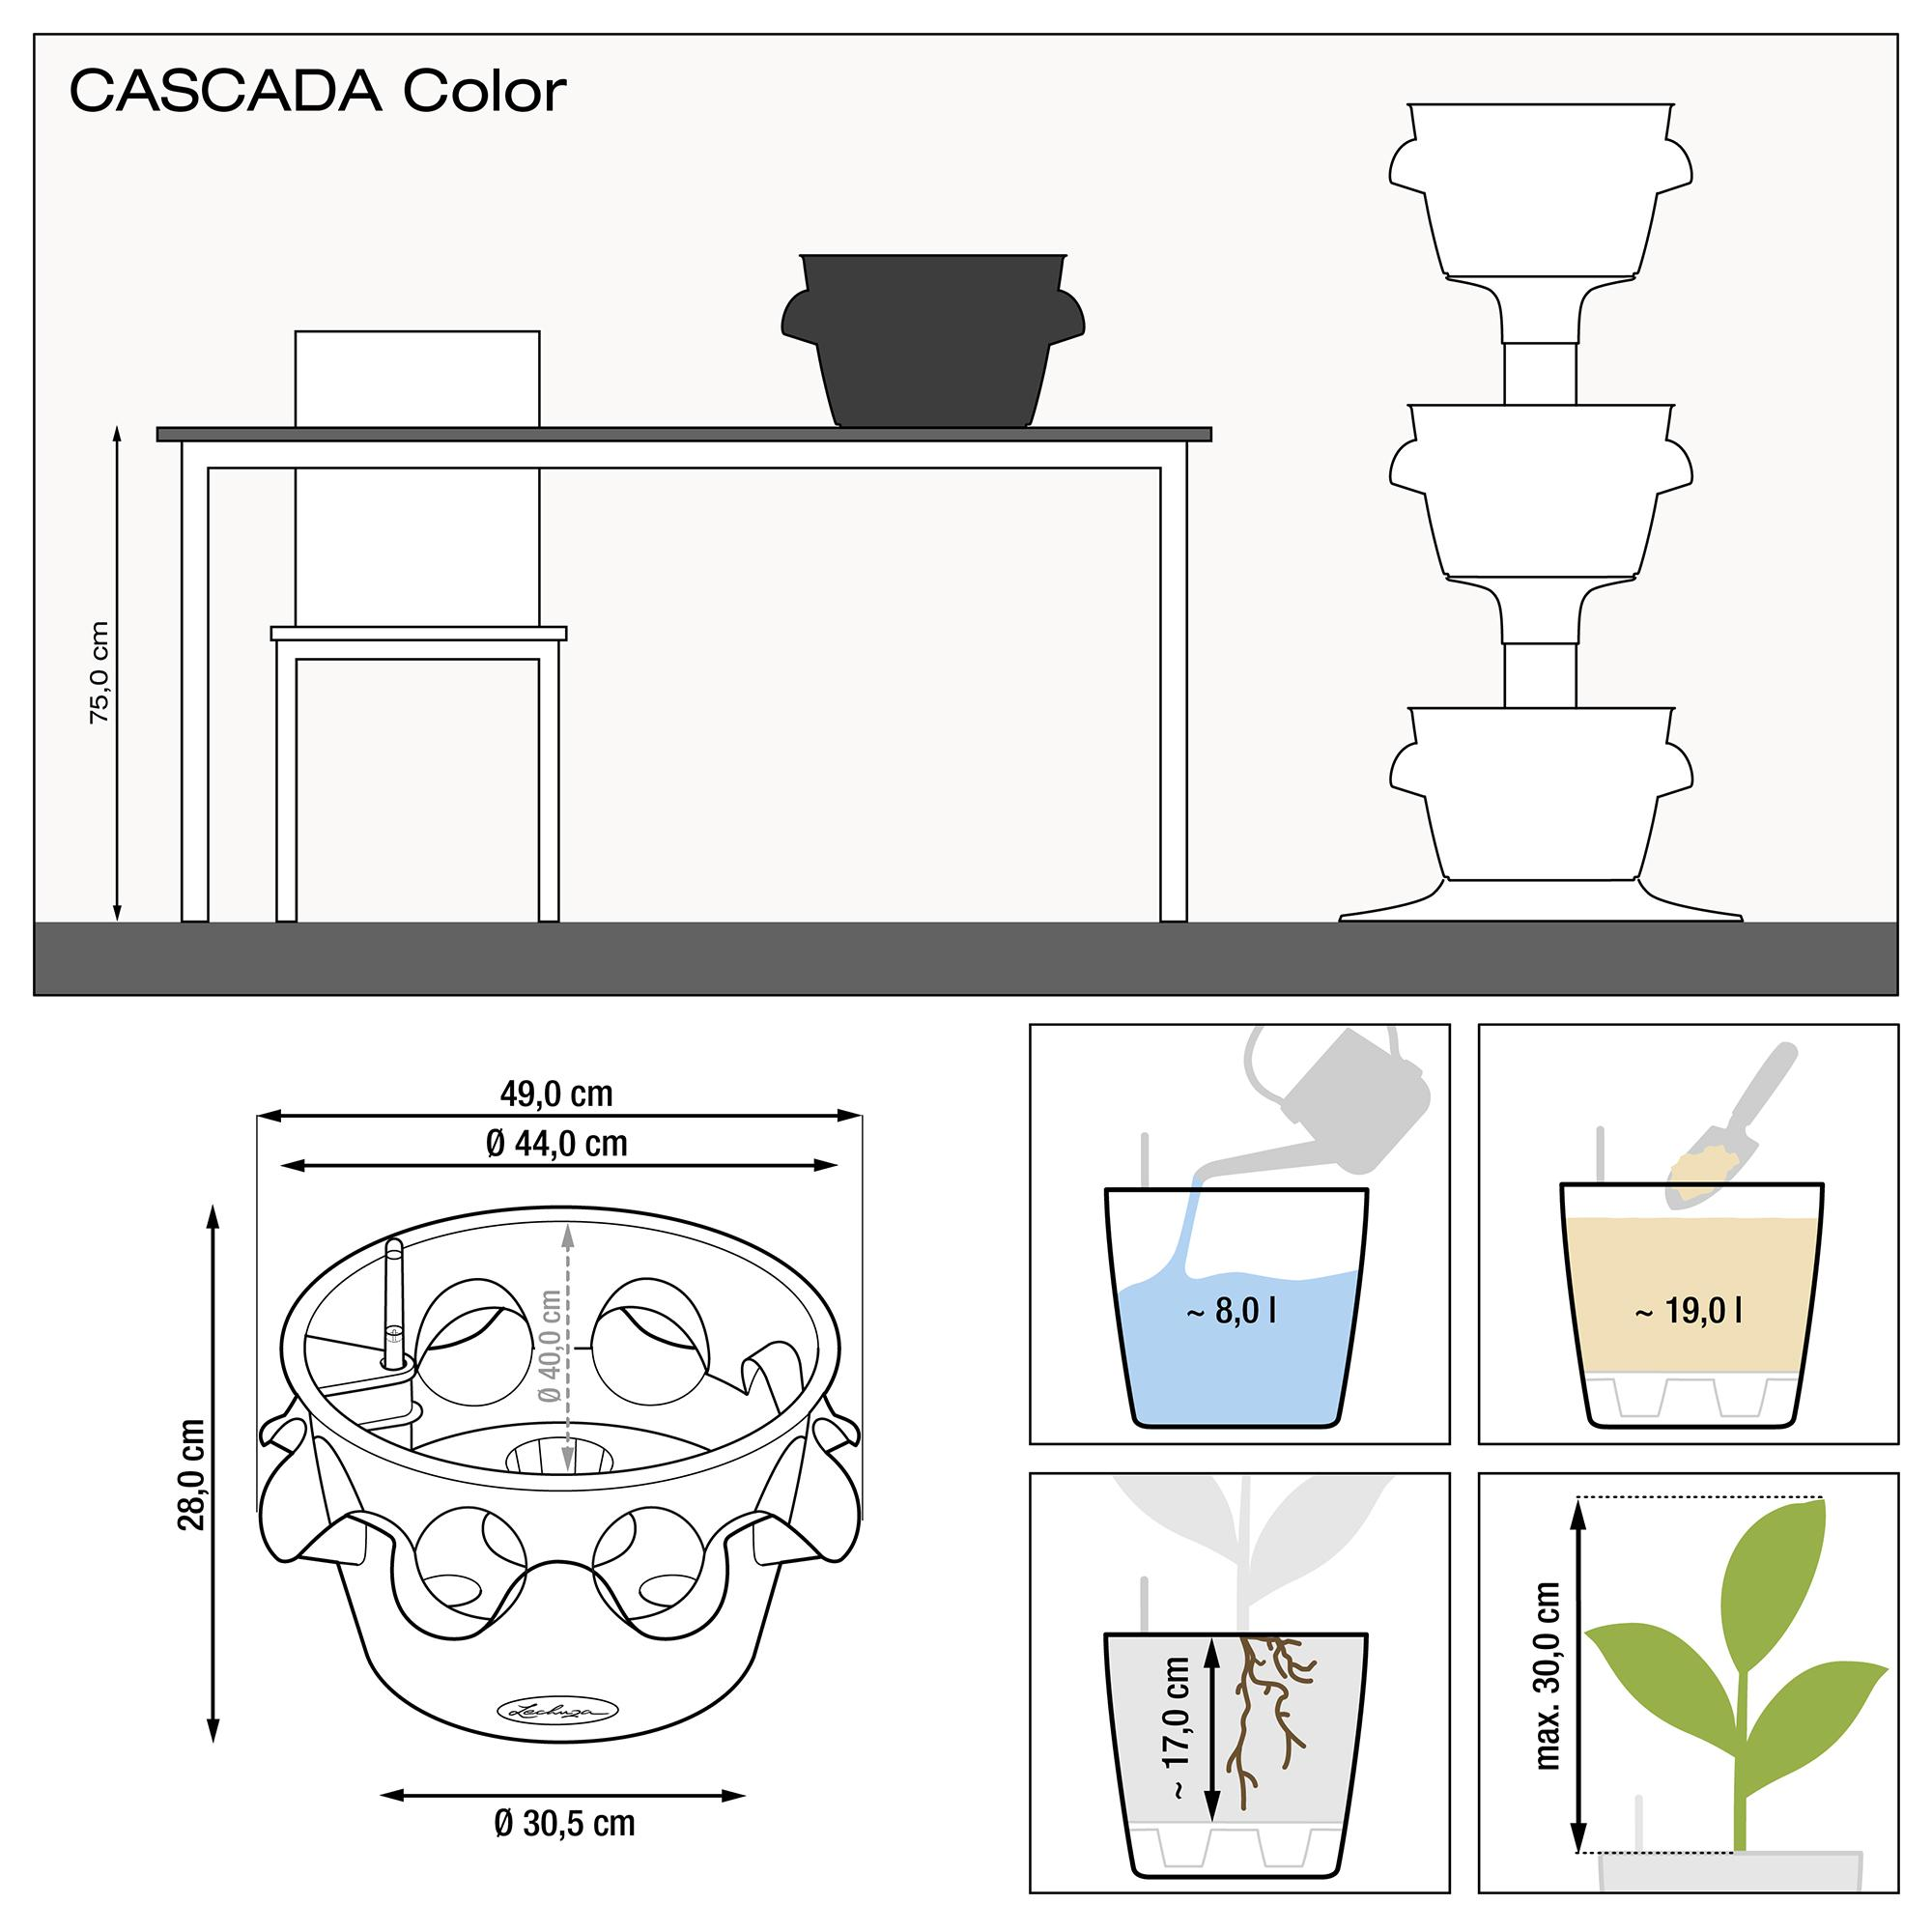 CASCADA Color gris ardoise - Image 2